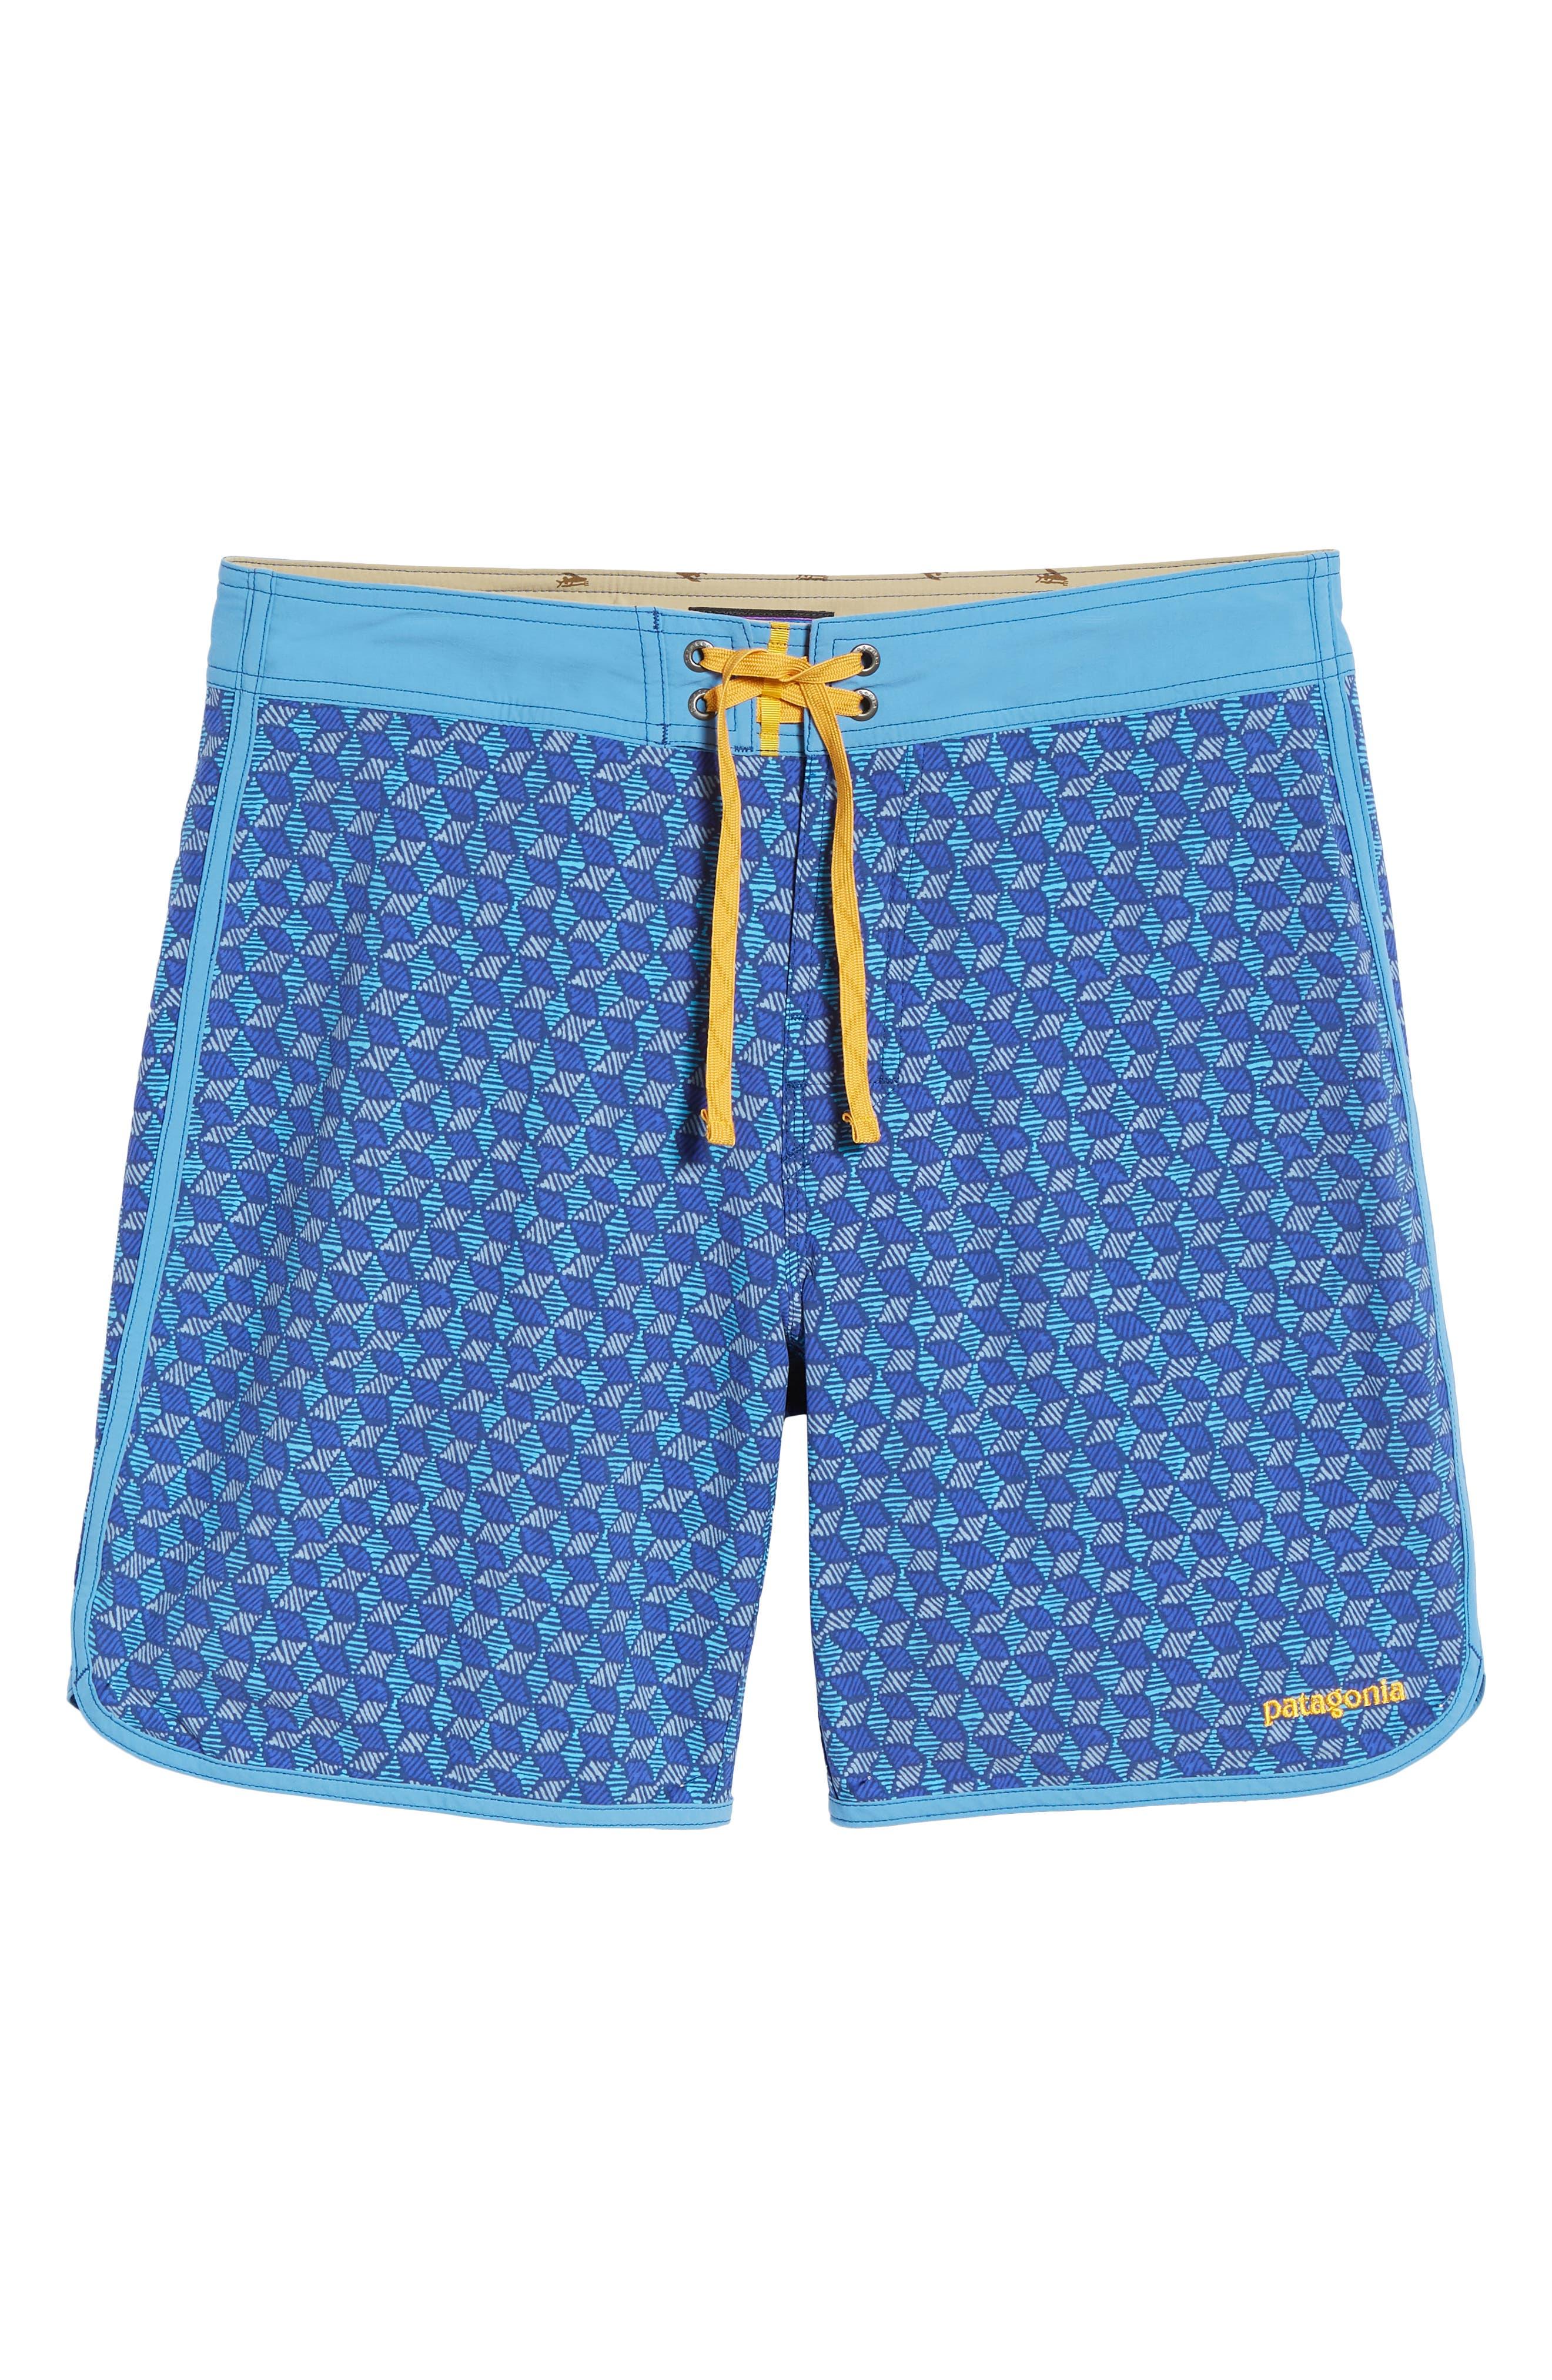 Wavefarer Swim Trunks,                             Alternate thumbnail 6, color,                             BATIK HEX MULTI/ RADAR BLUE